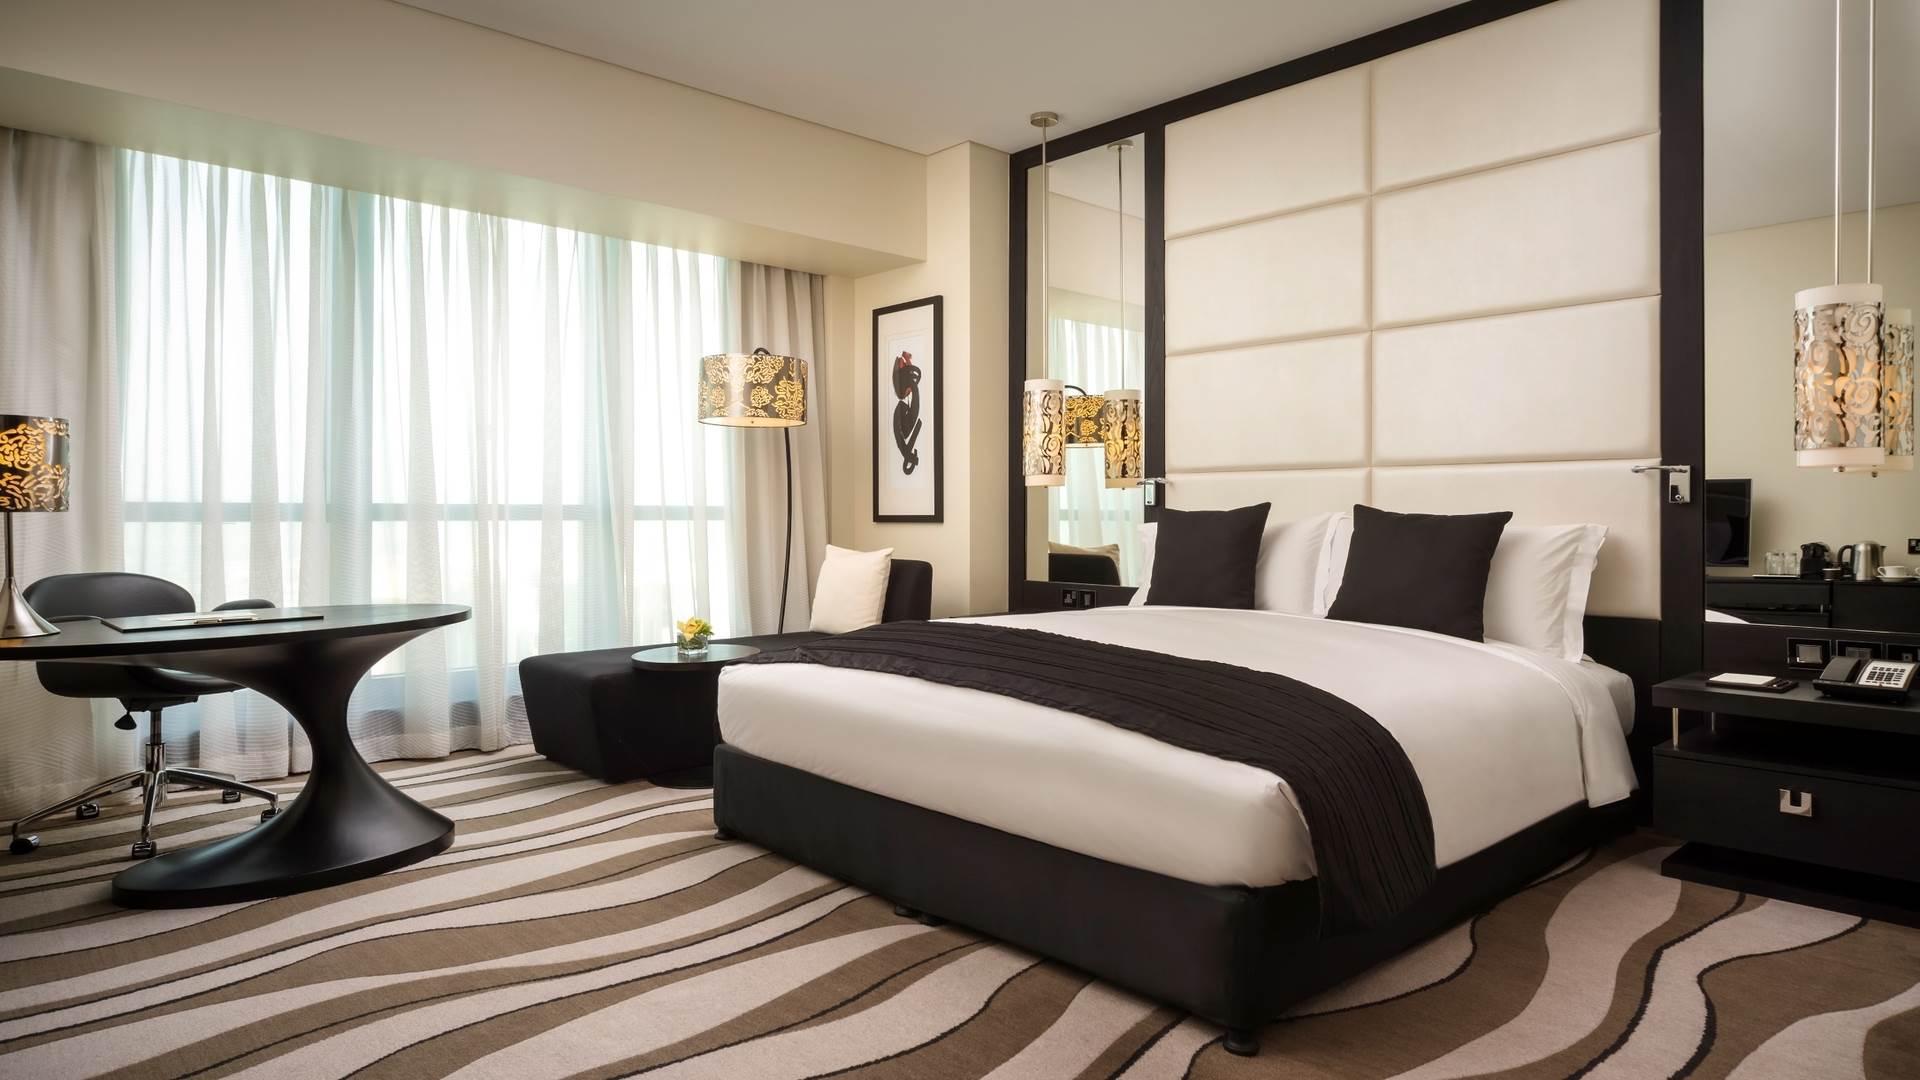 luxury-room-club-sofitel-1-king-size-bed-sea-view